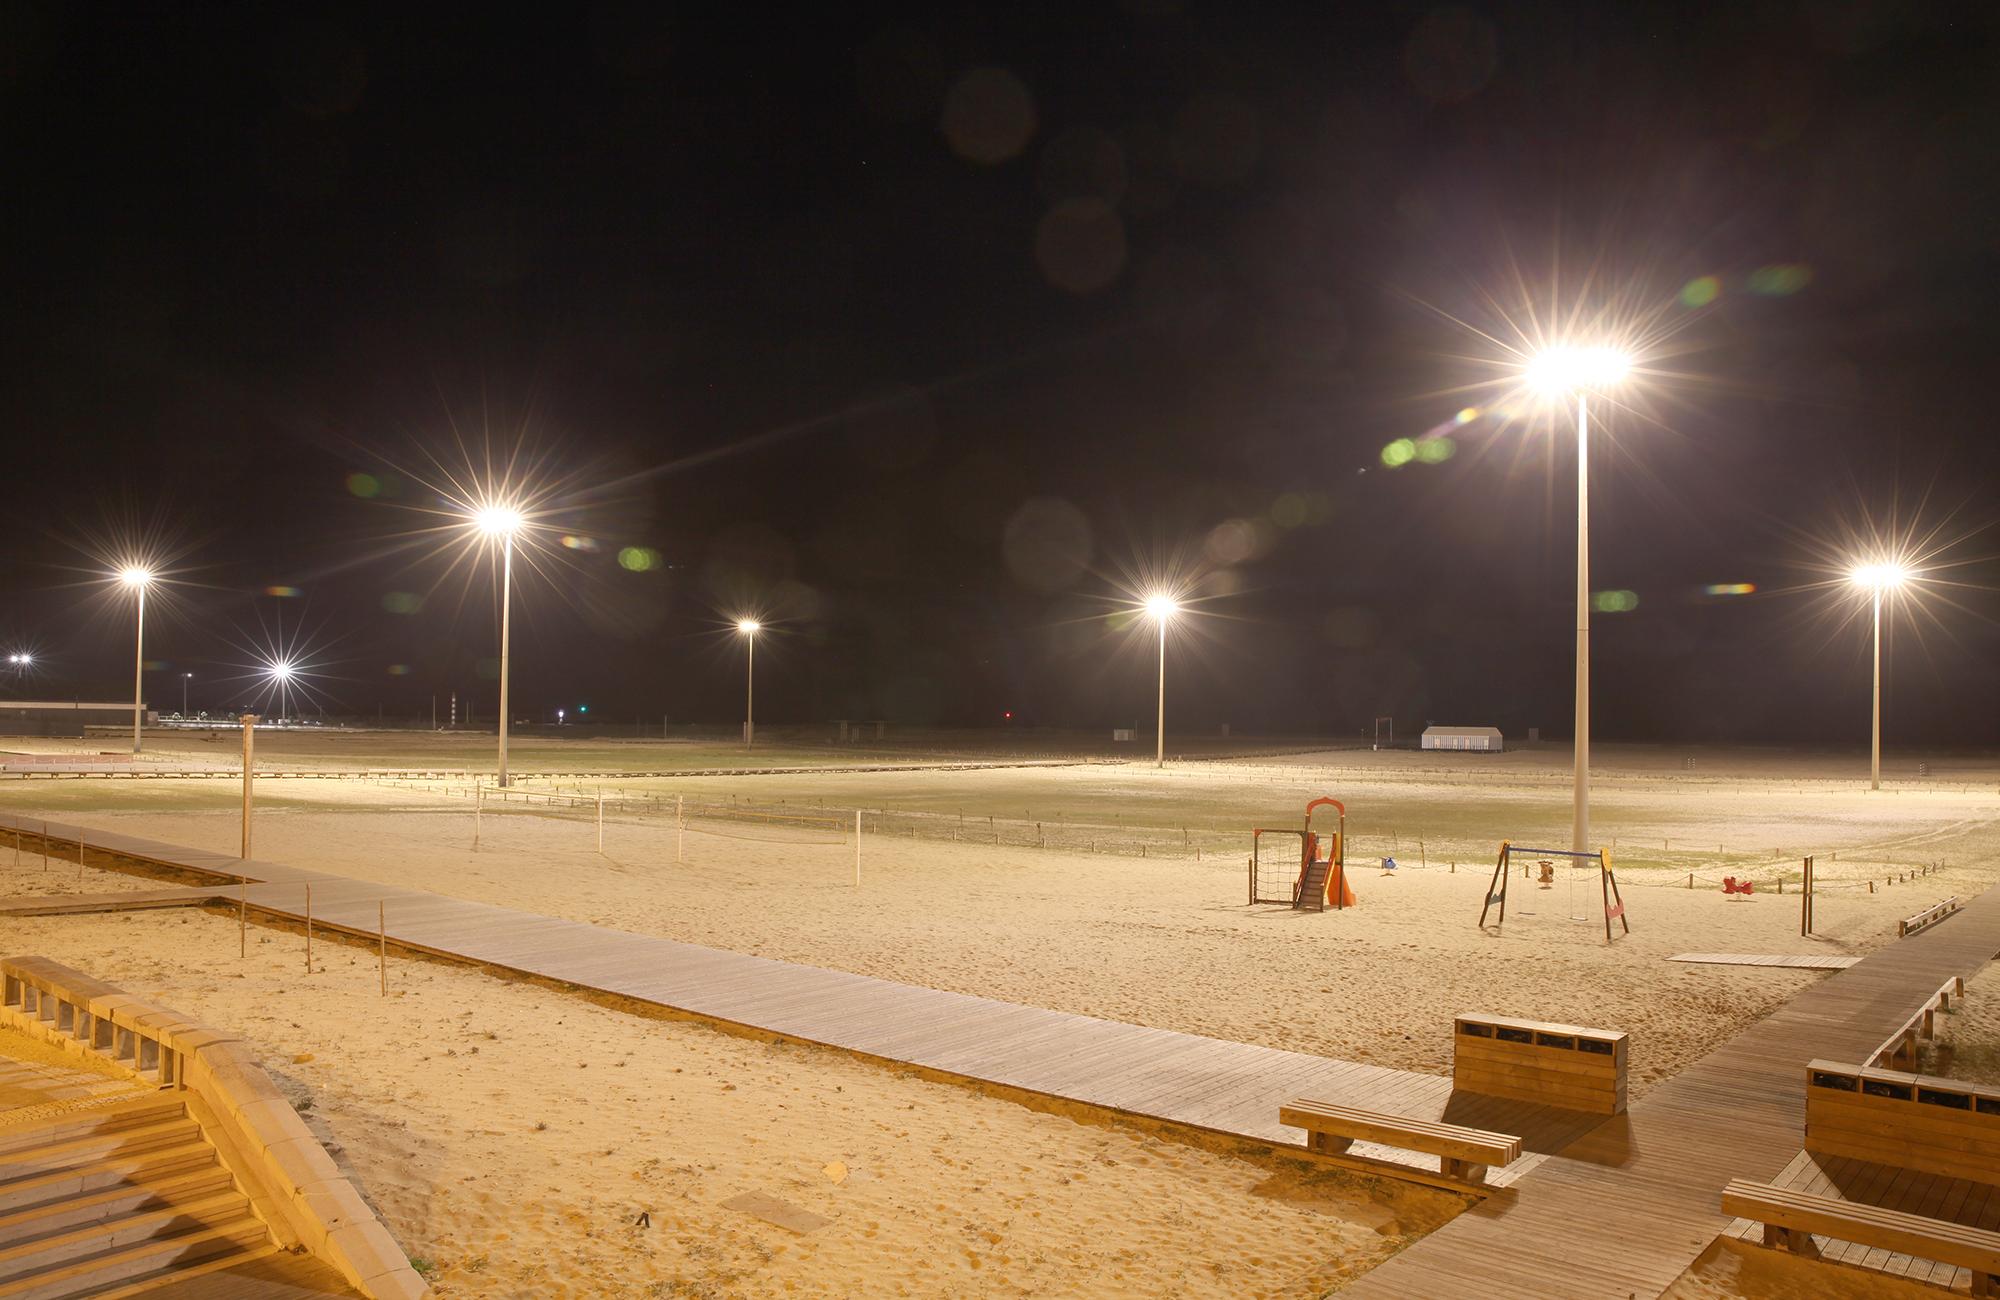 Avento-IoT-AREA-figueira-da-foz-Beach-PTS-IMG_9157